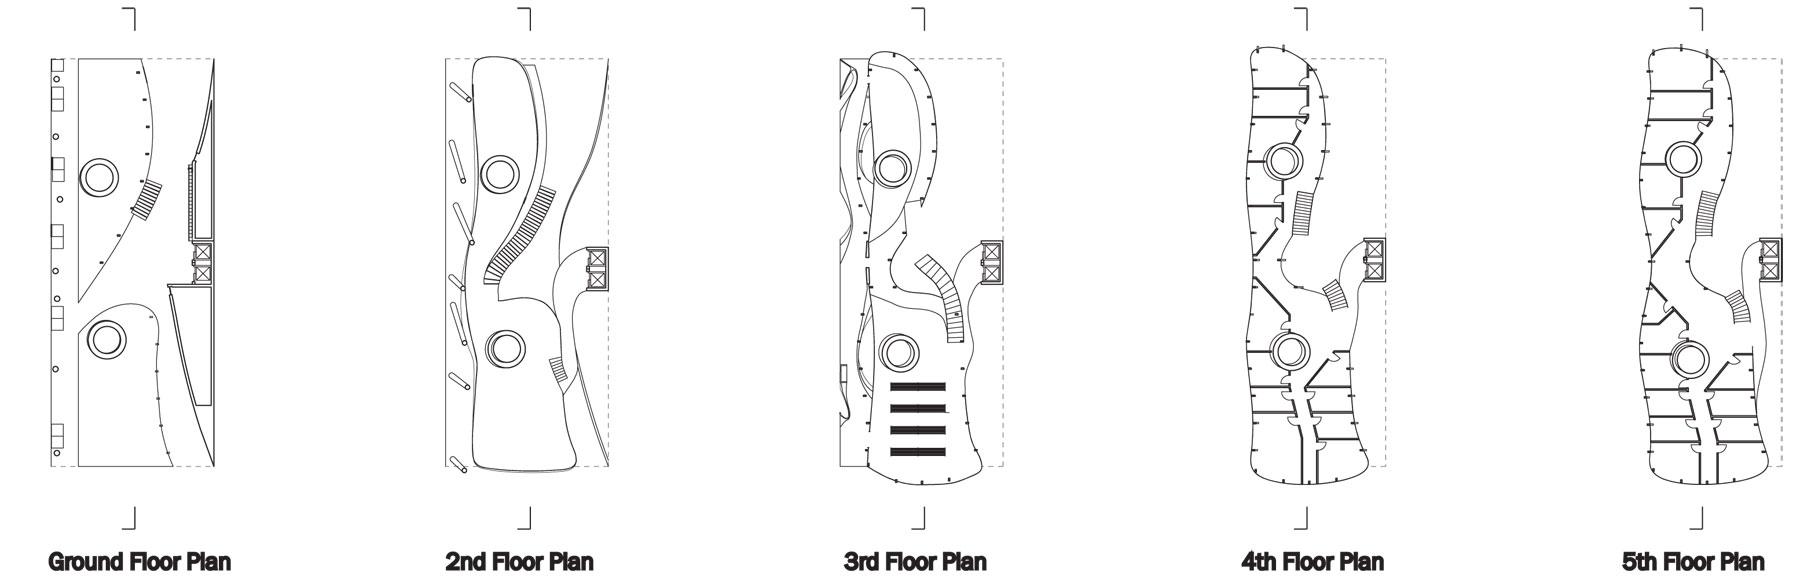 SP-Plans-1st-5th.jpg